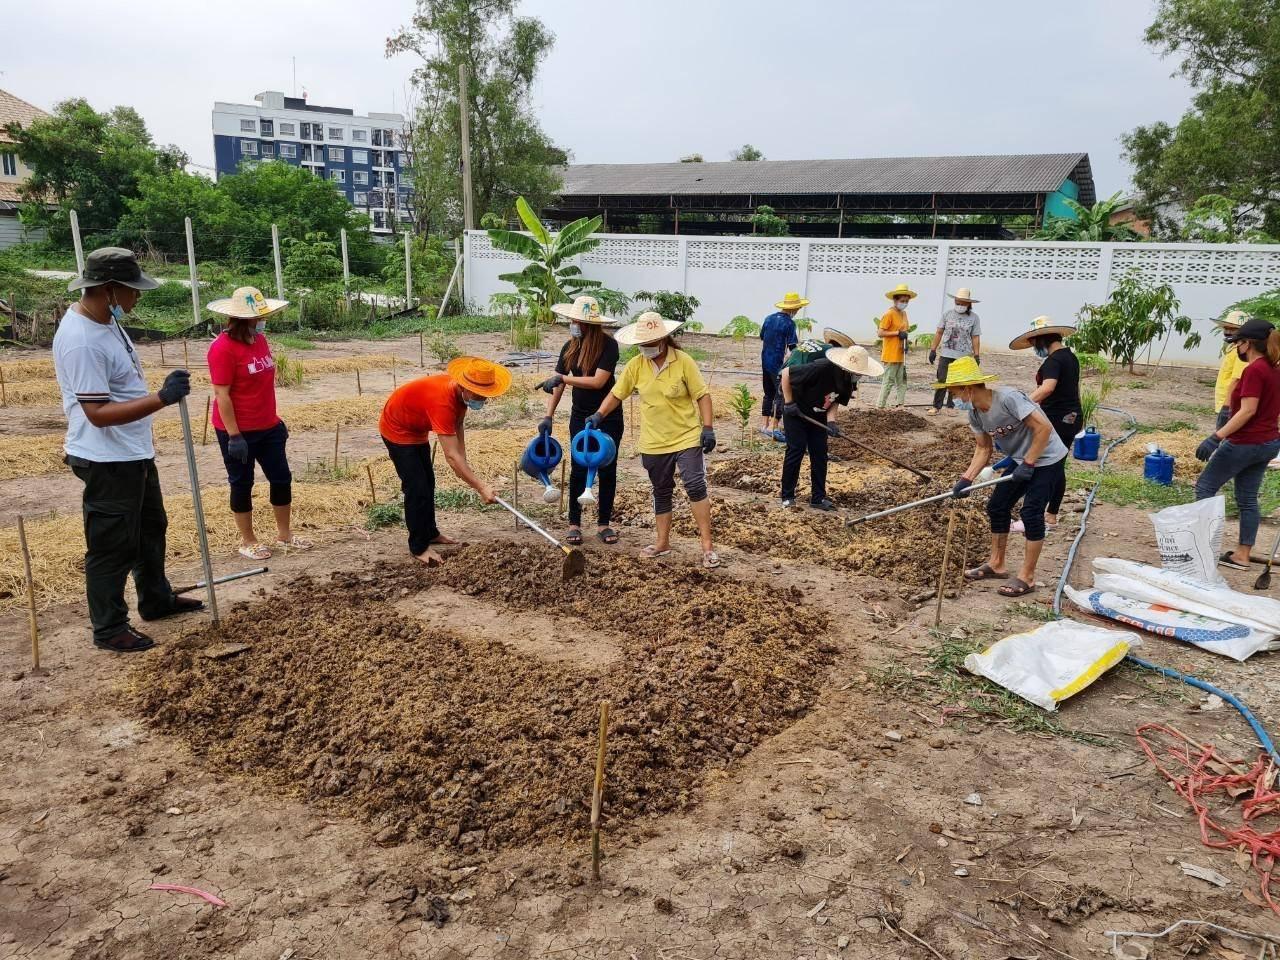 'City farms' help ease Covid impact